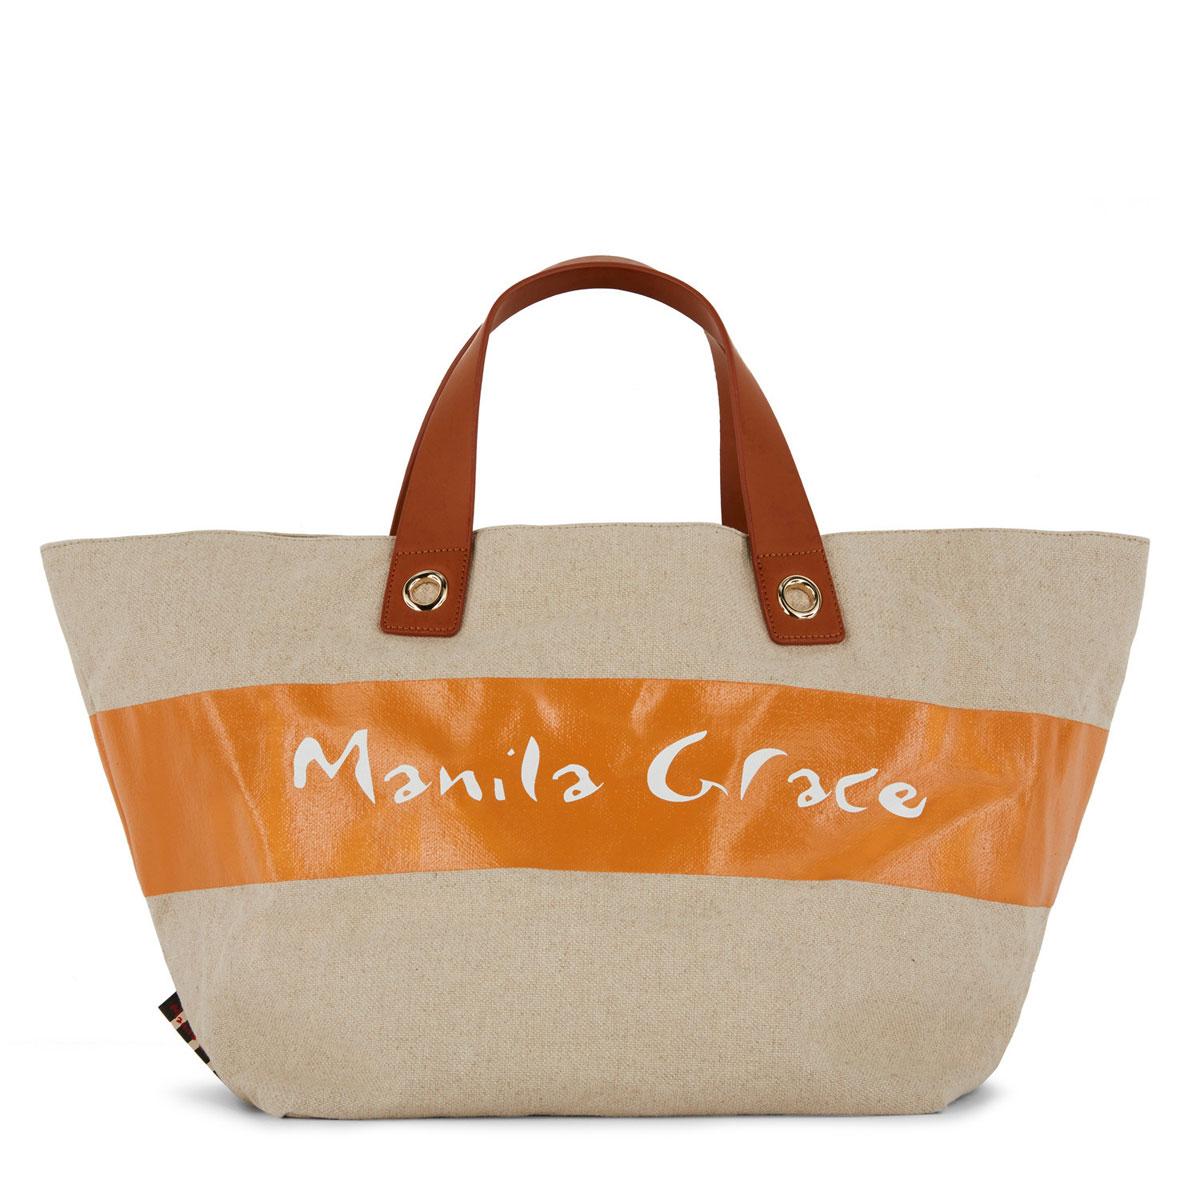 ●〇093-00823-md643Manila Grace【マニラグレース】B074CU-MD643SALE50%OFF